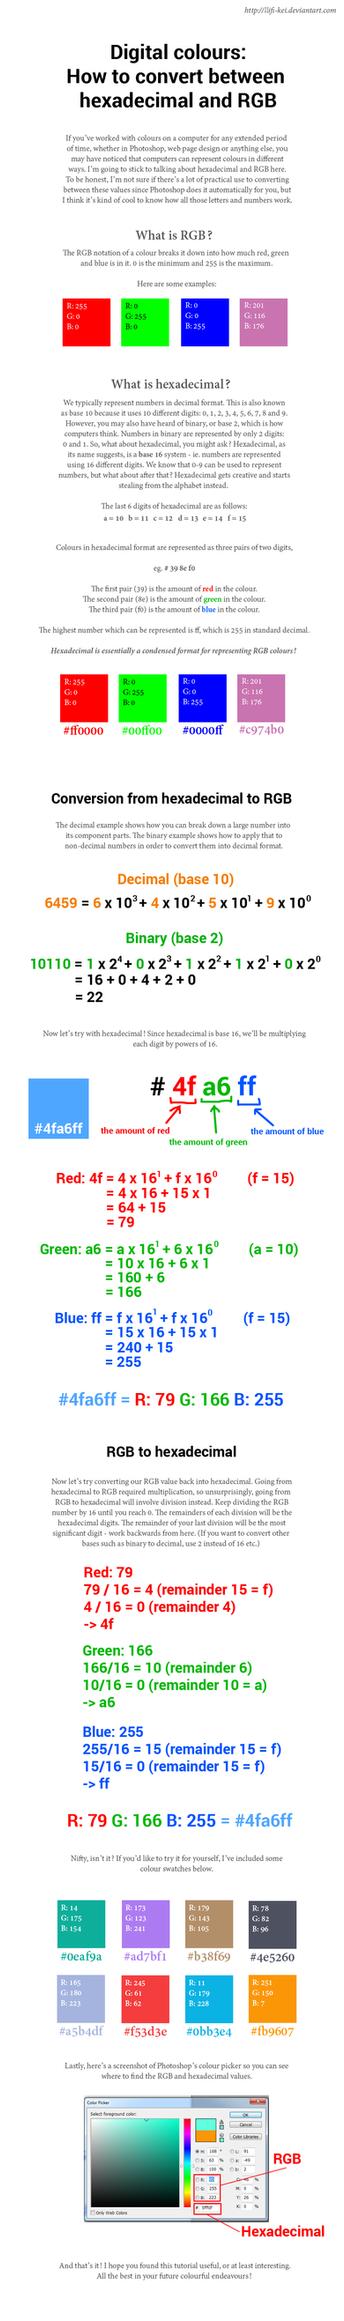 How to convert between hexadecimal and RGB by llifi-kei